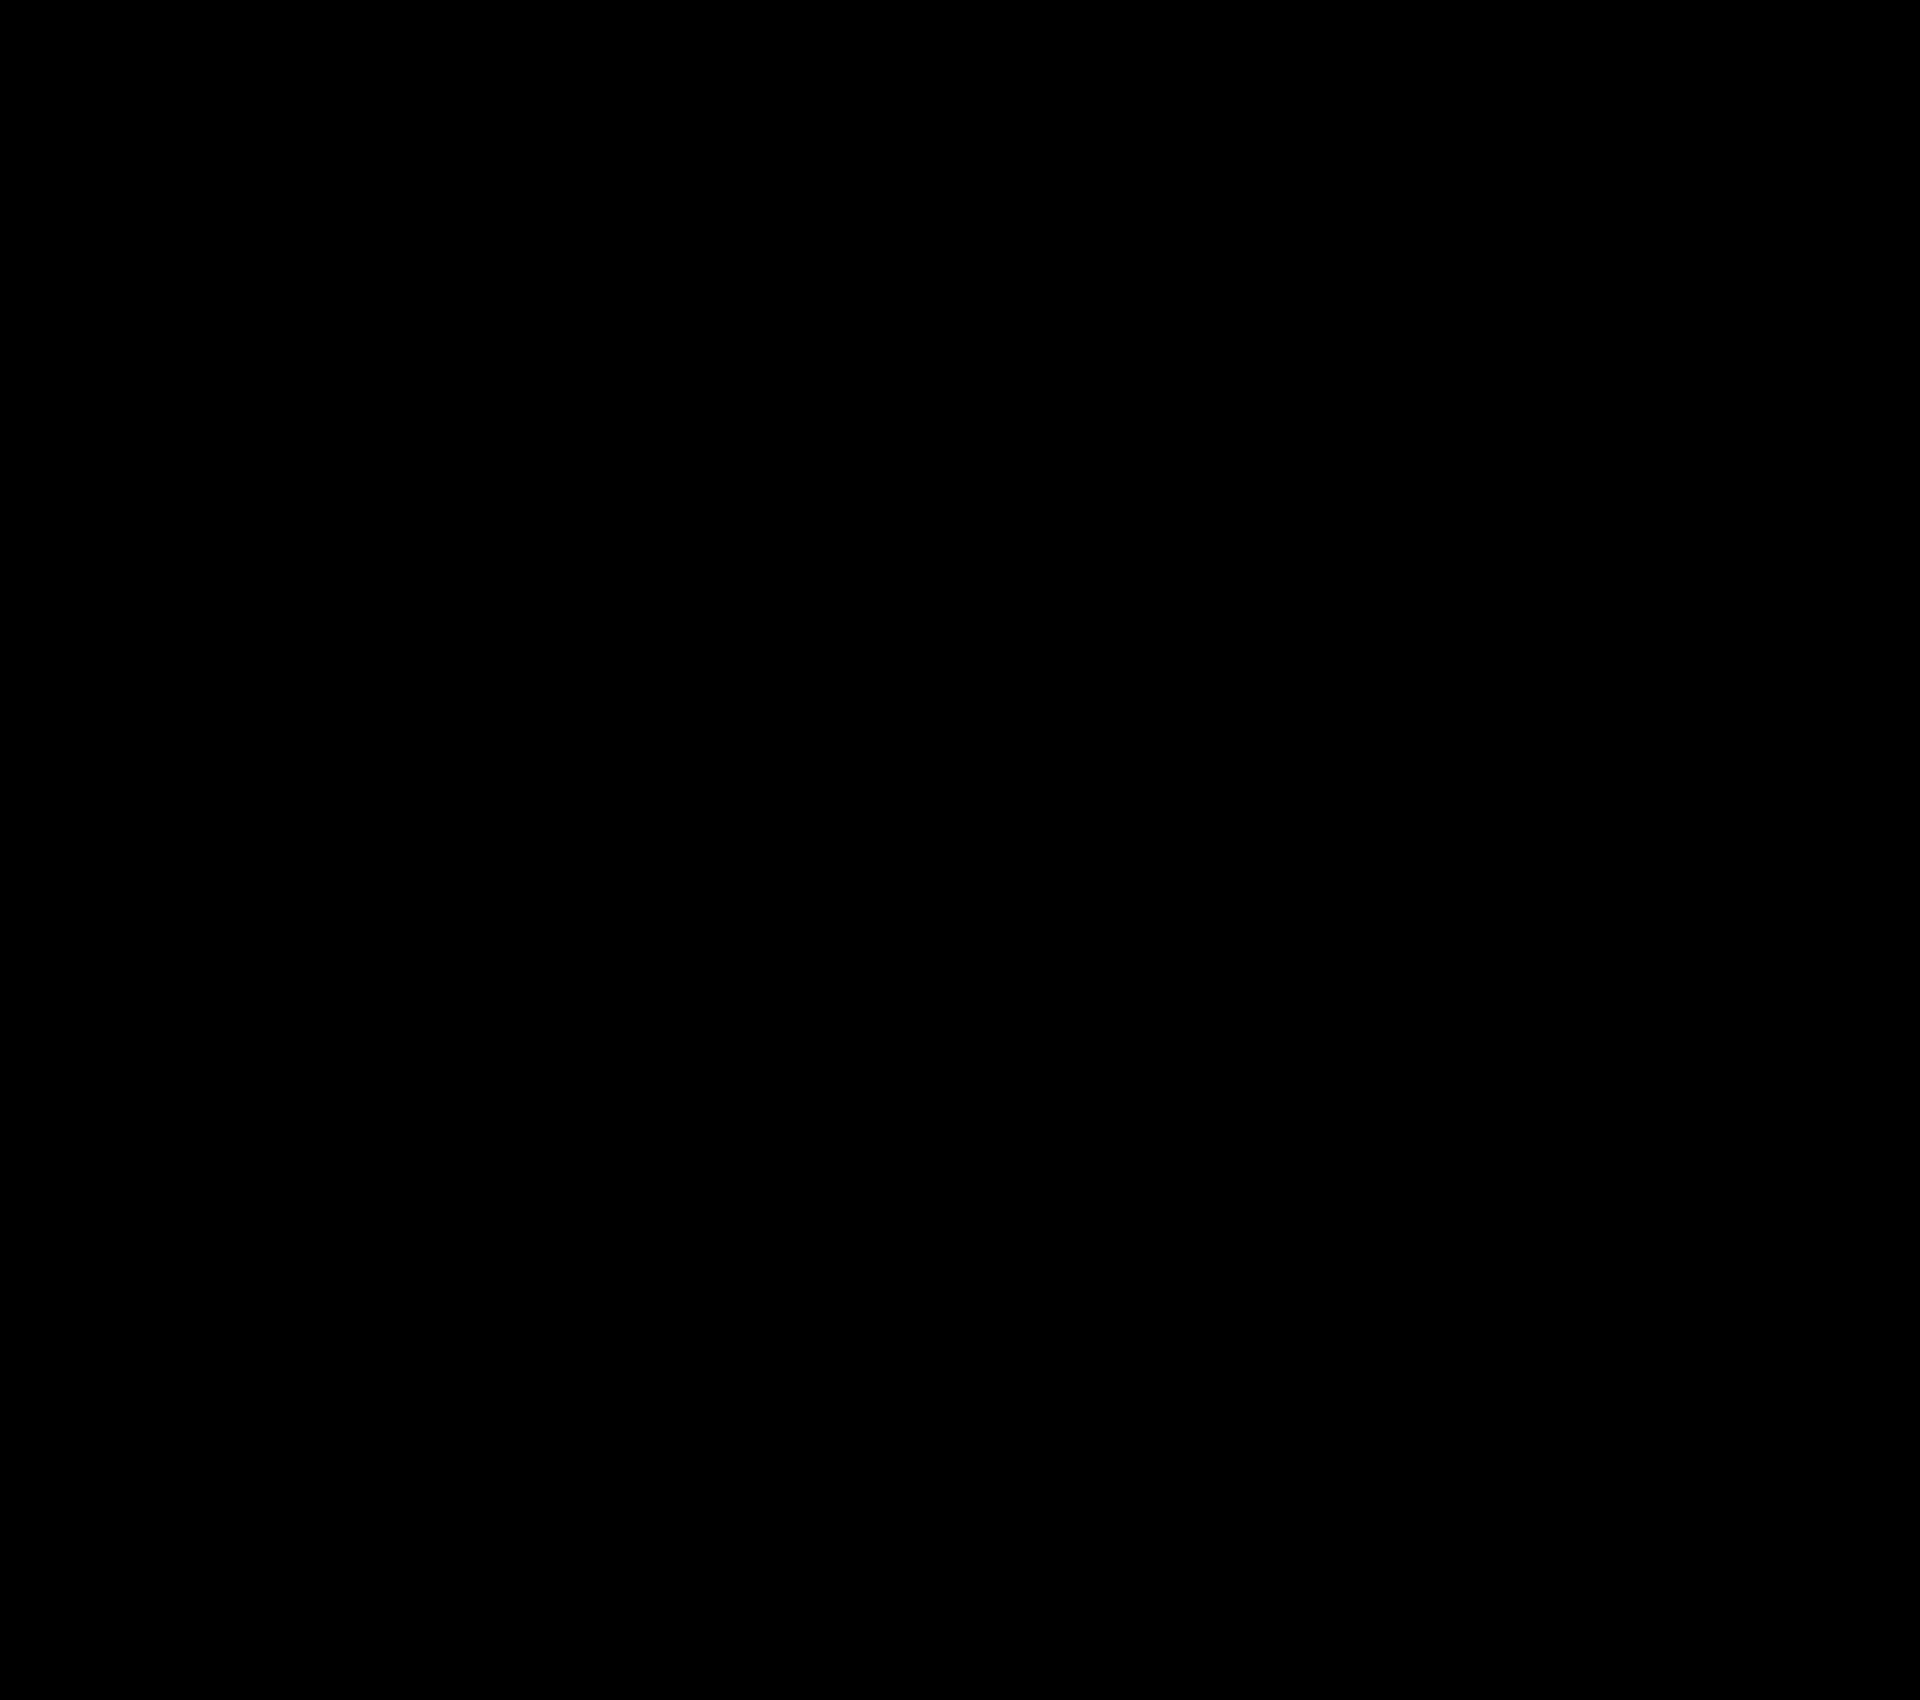 blank-1920×1700-1